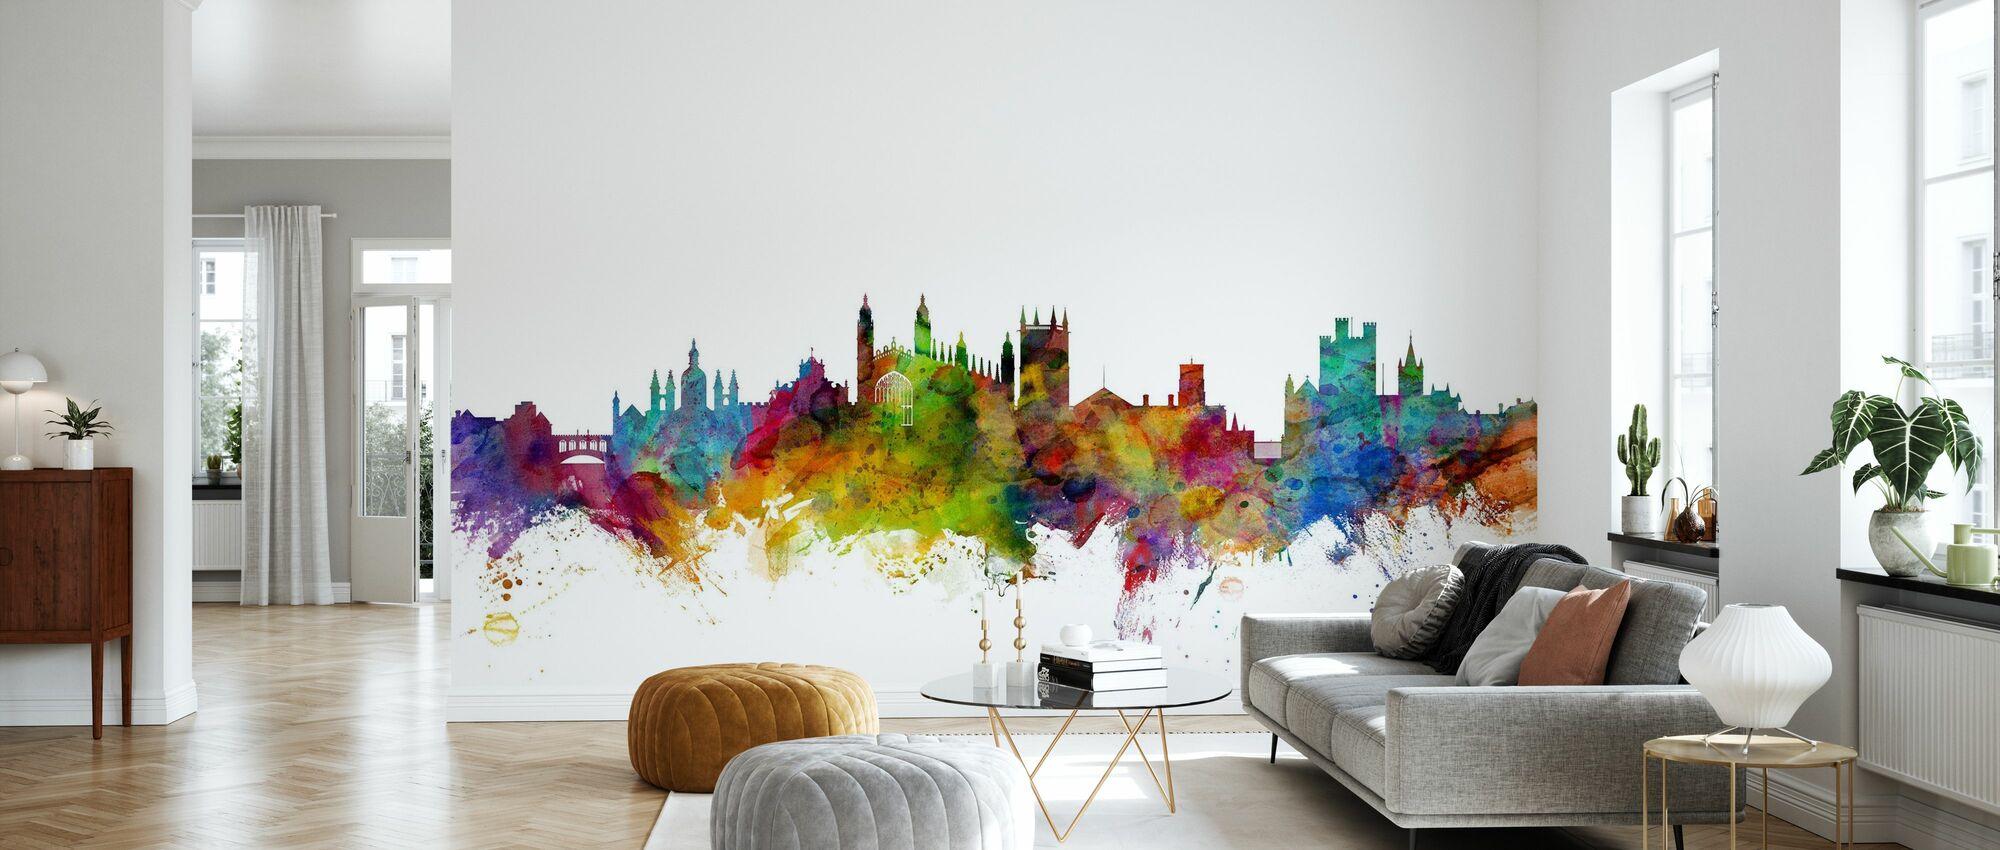 Cambridge Skyline - Wallpaper - Living Room